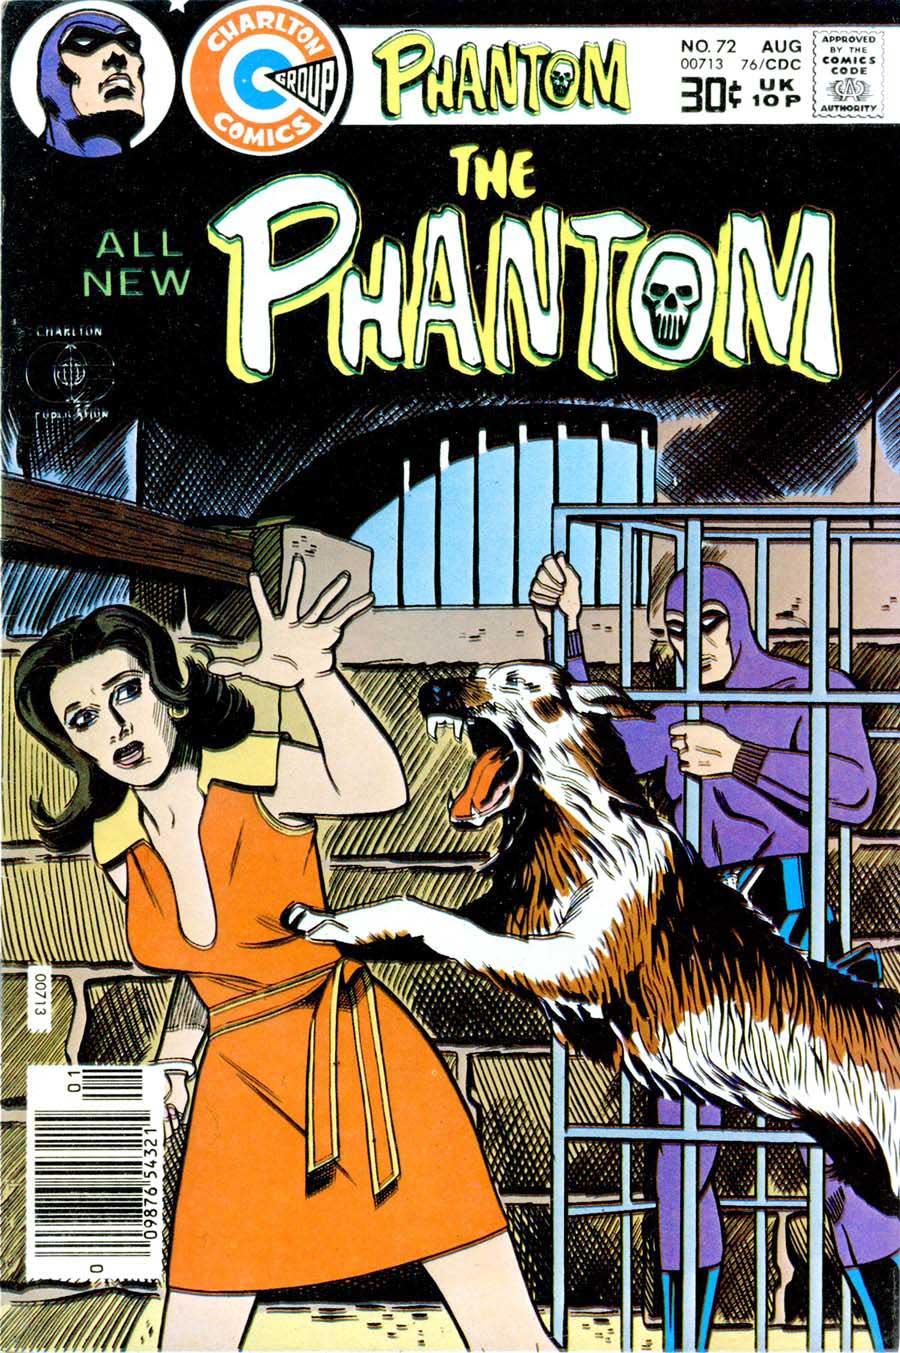 The Phantom v2 #72 - mis-attributed Don Newton art & cover ...